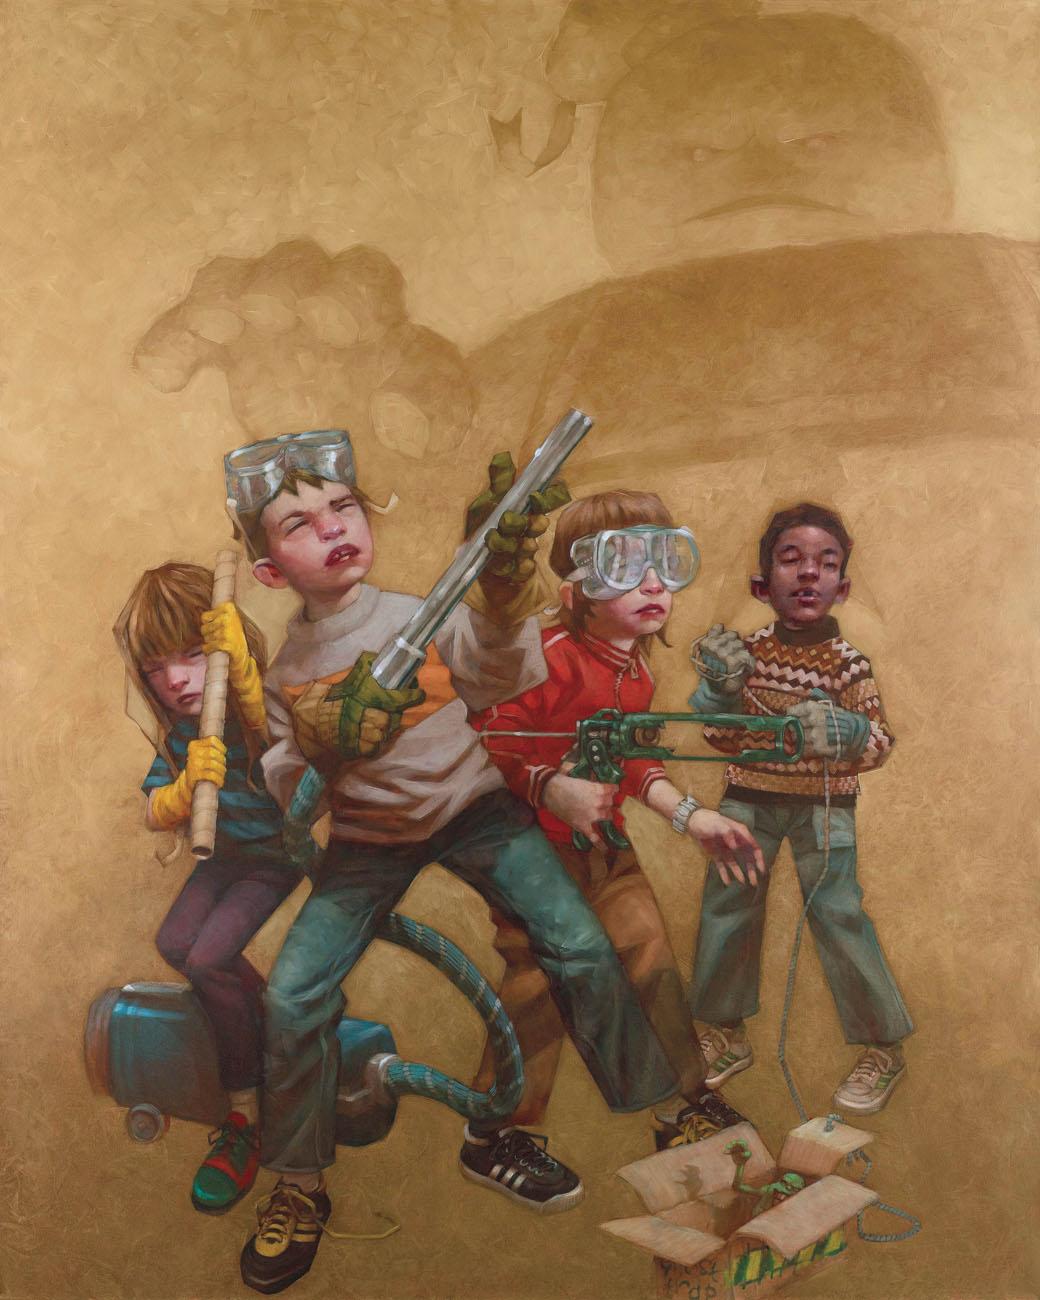 Bustin' Makes Me Feel Good - Boxed Canvas by Craig Davison